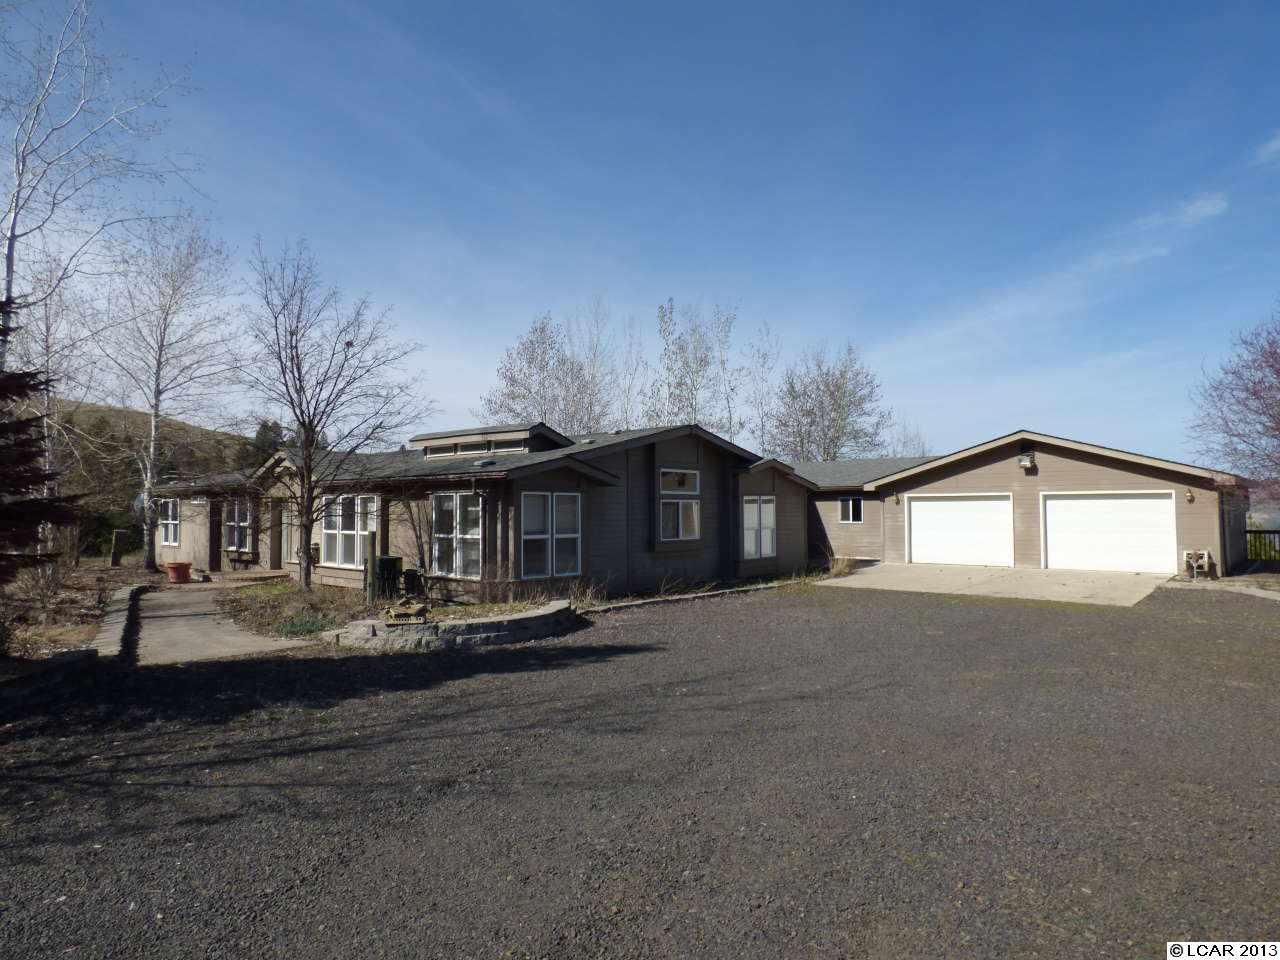 Real Estate for Sale, ListingId: 32708157, Lenore,ID83541